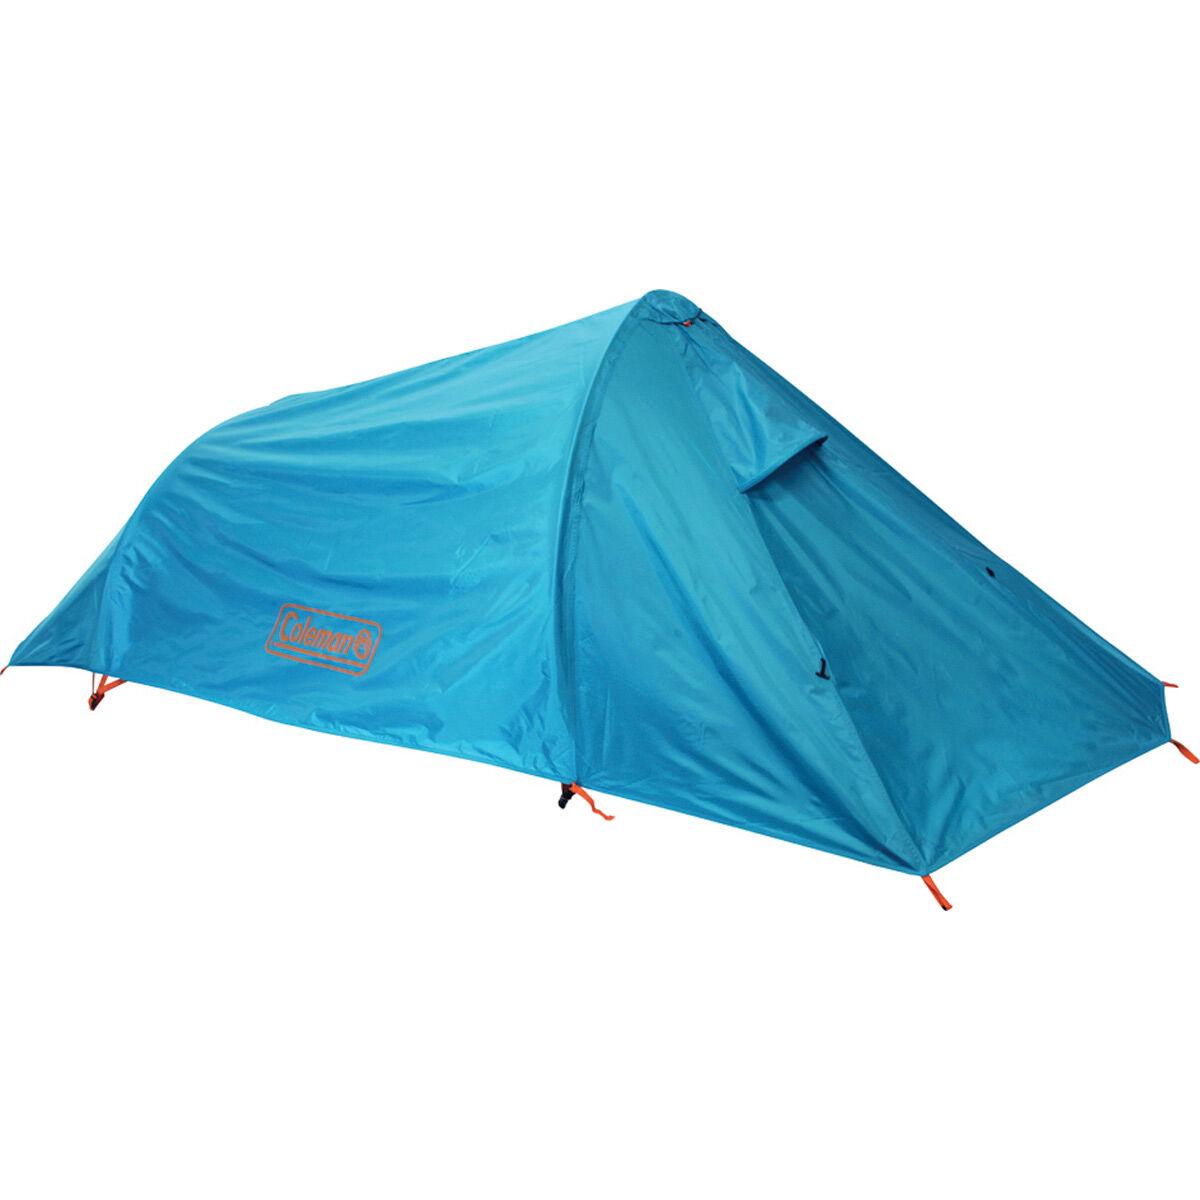 Coleman Ridgeline Hiking Tent 3 Person  bcf_hi-res  sc 1 st  BCF & Coleman Ridgeline Hiking Tent 3 Person